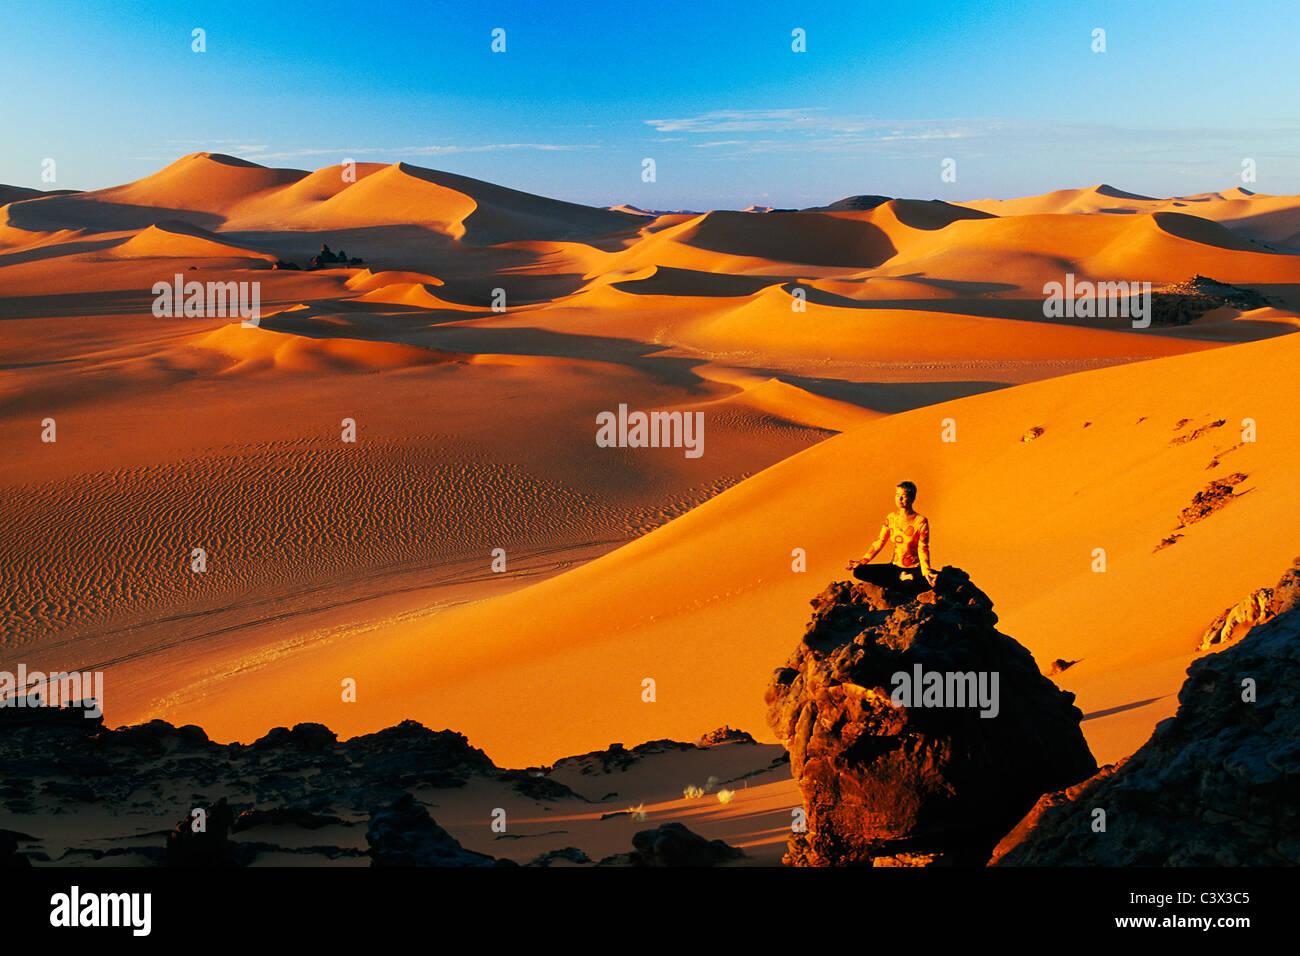 Algeria, Djanet. Sand dunes and rocks. Woman meditating. Sahara Desert. - Stock Image